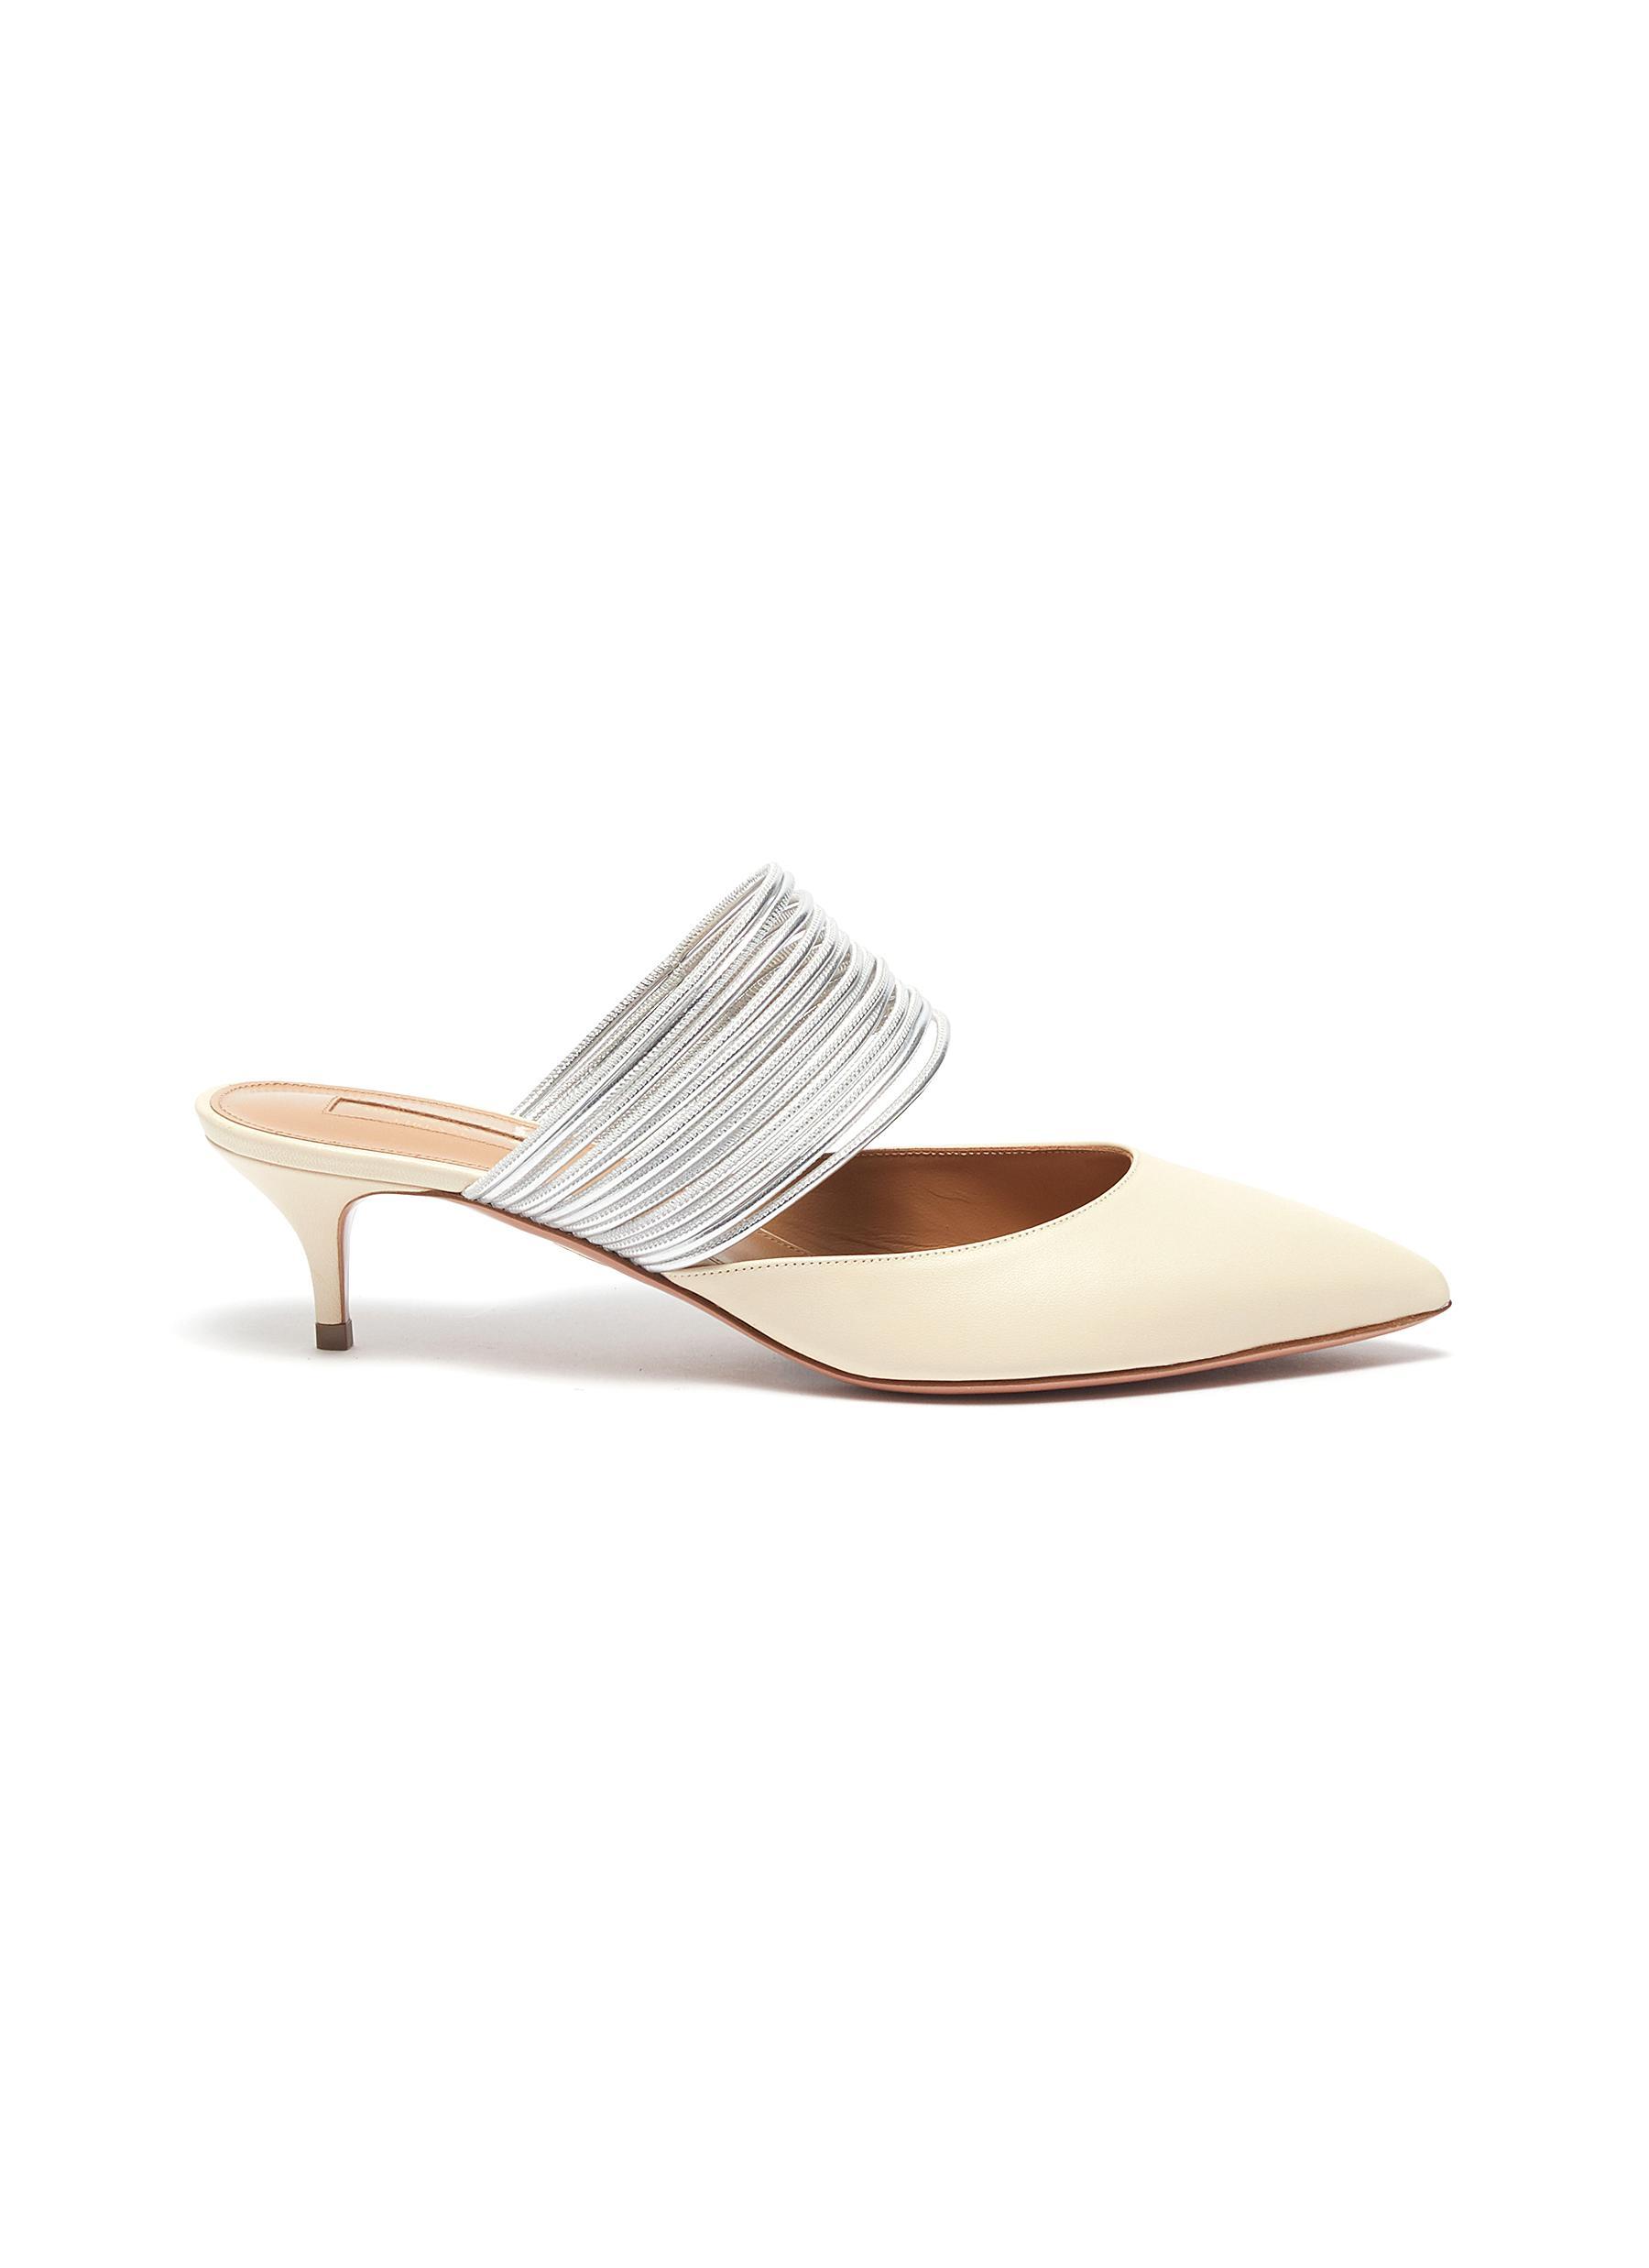 Aquazzura Low Heels Rendez Vous metallic strap leather mules